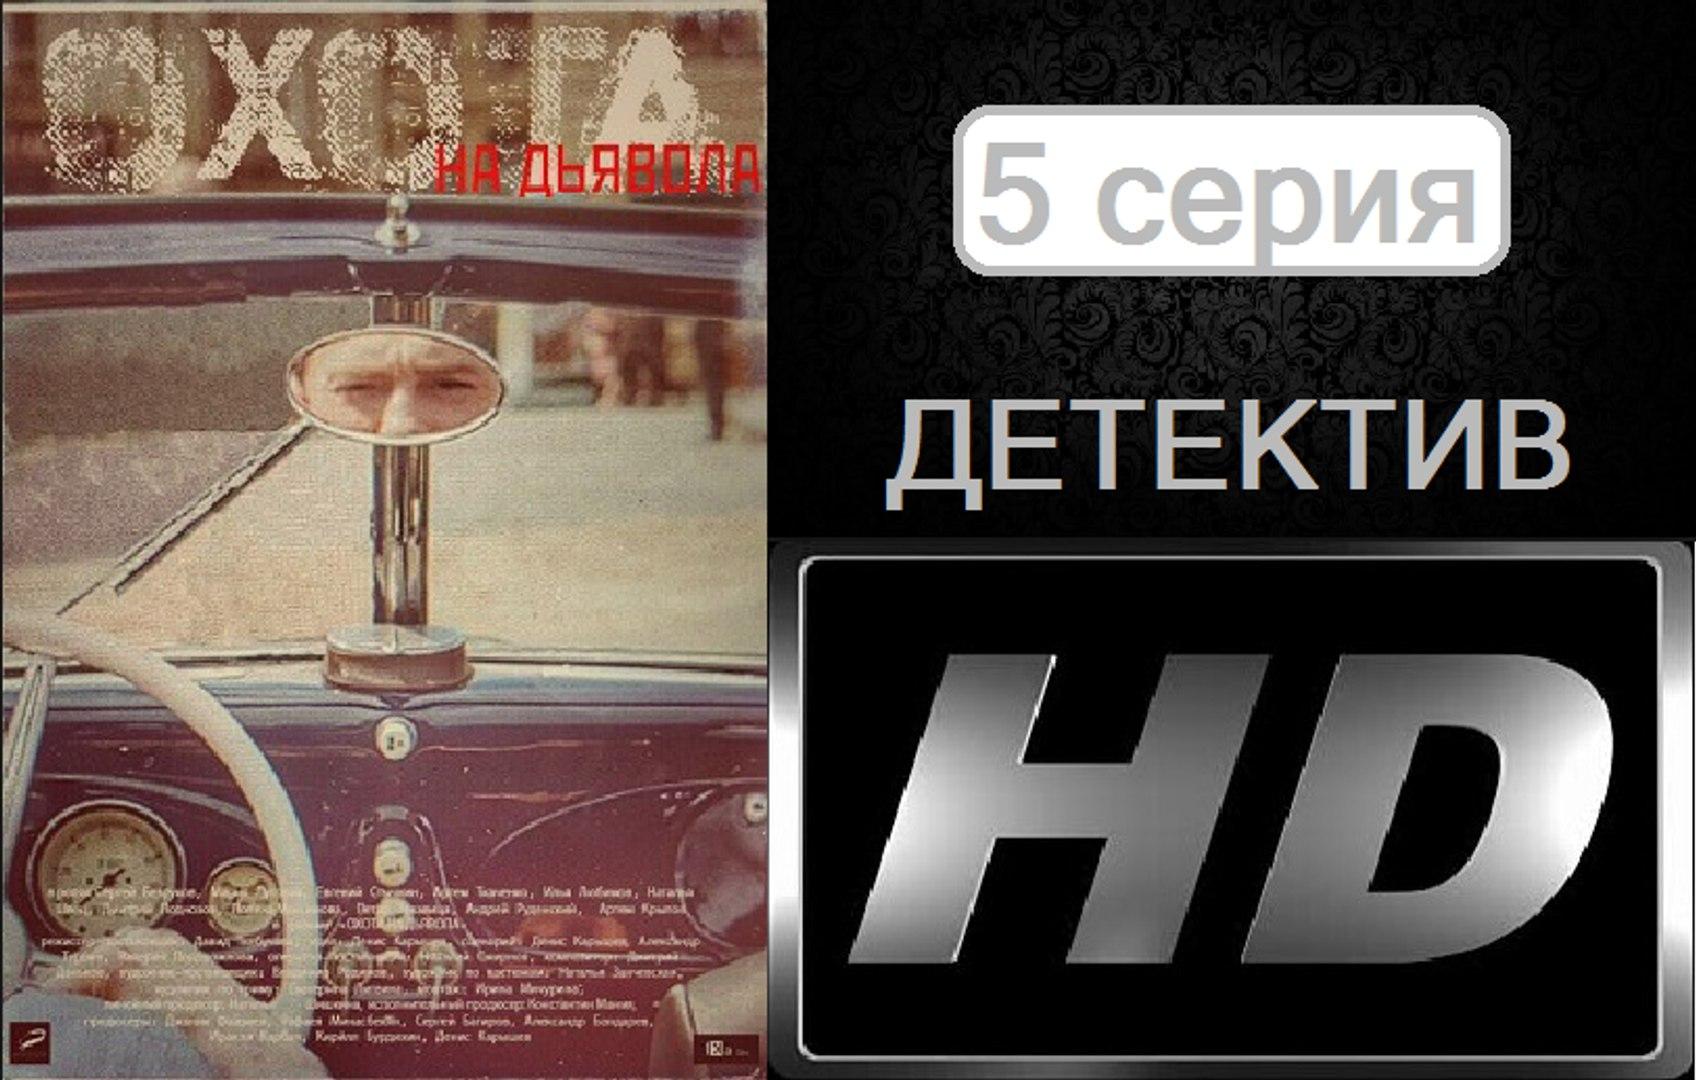 Охота на Дьявола 5 серия. Сериал (2017). Шпионский Детектив